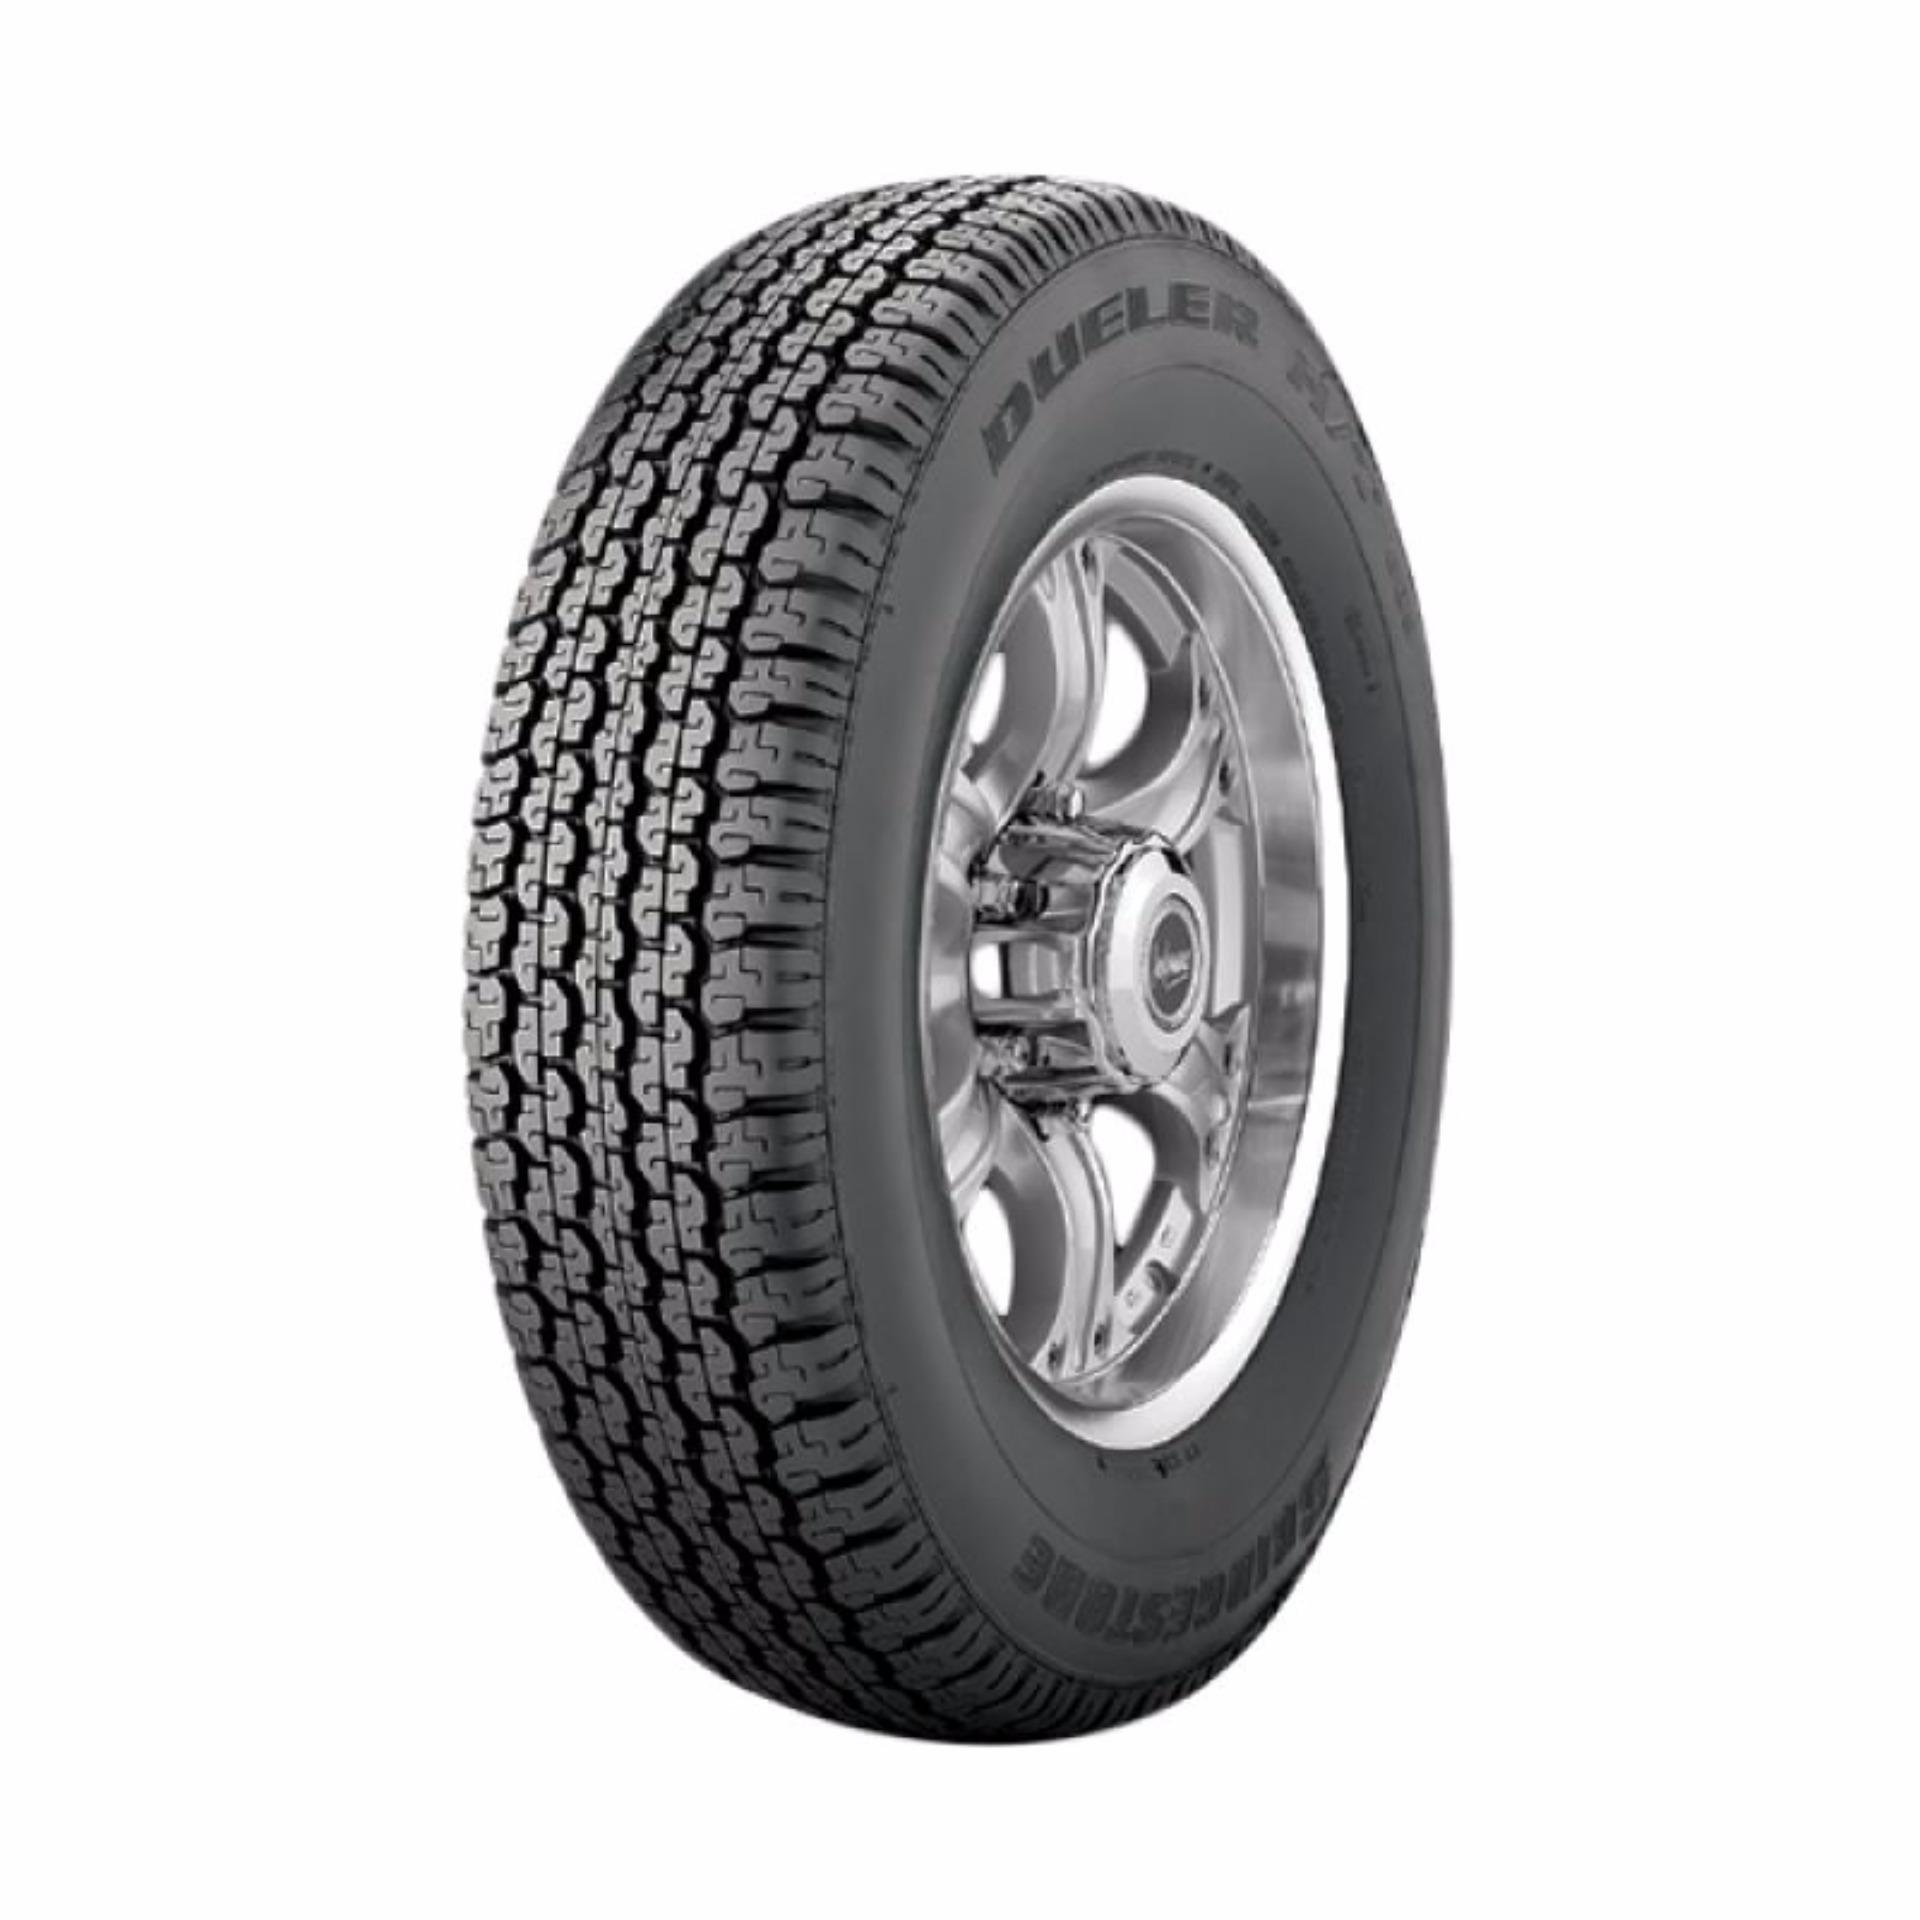 Bridgestone Dueller 689 215/65 R16 Ban Mobil [GRATIS INSTALASI]